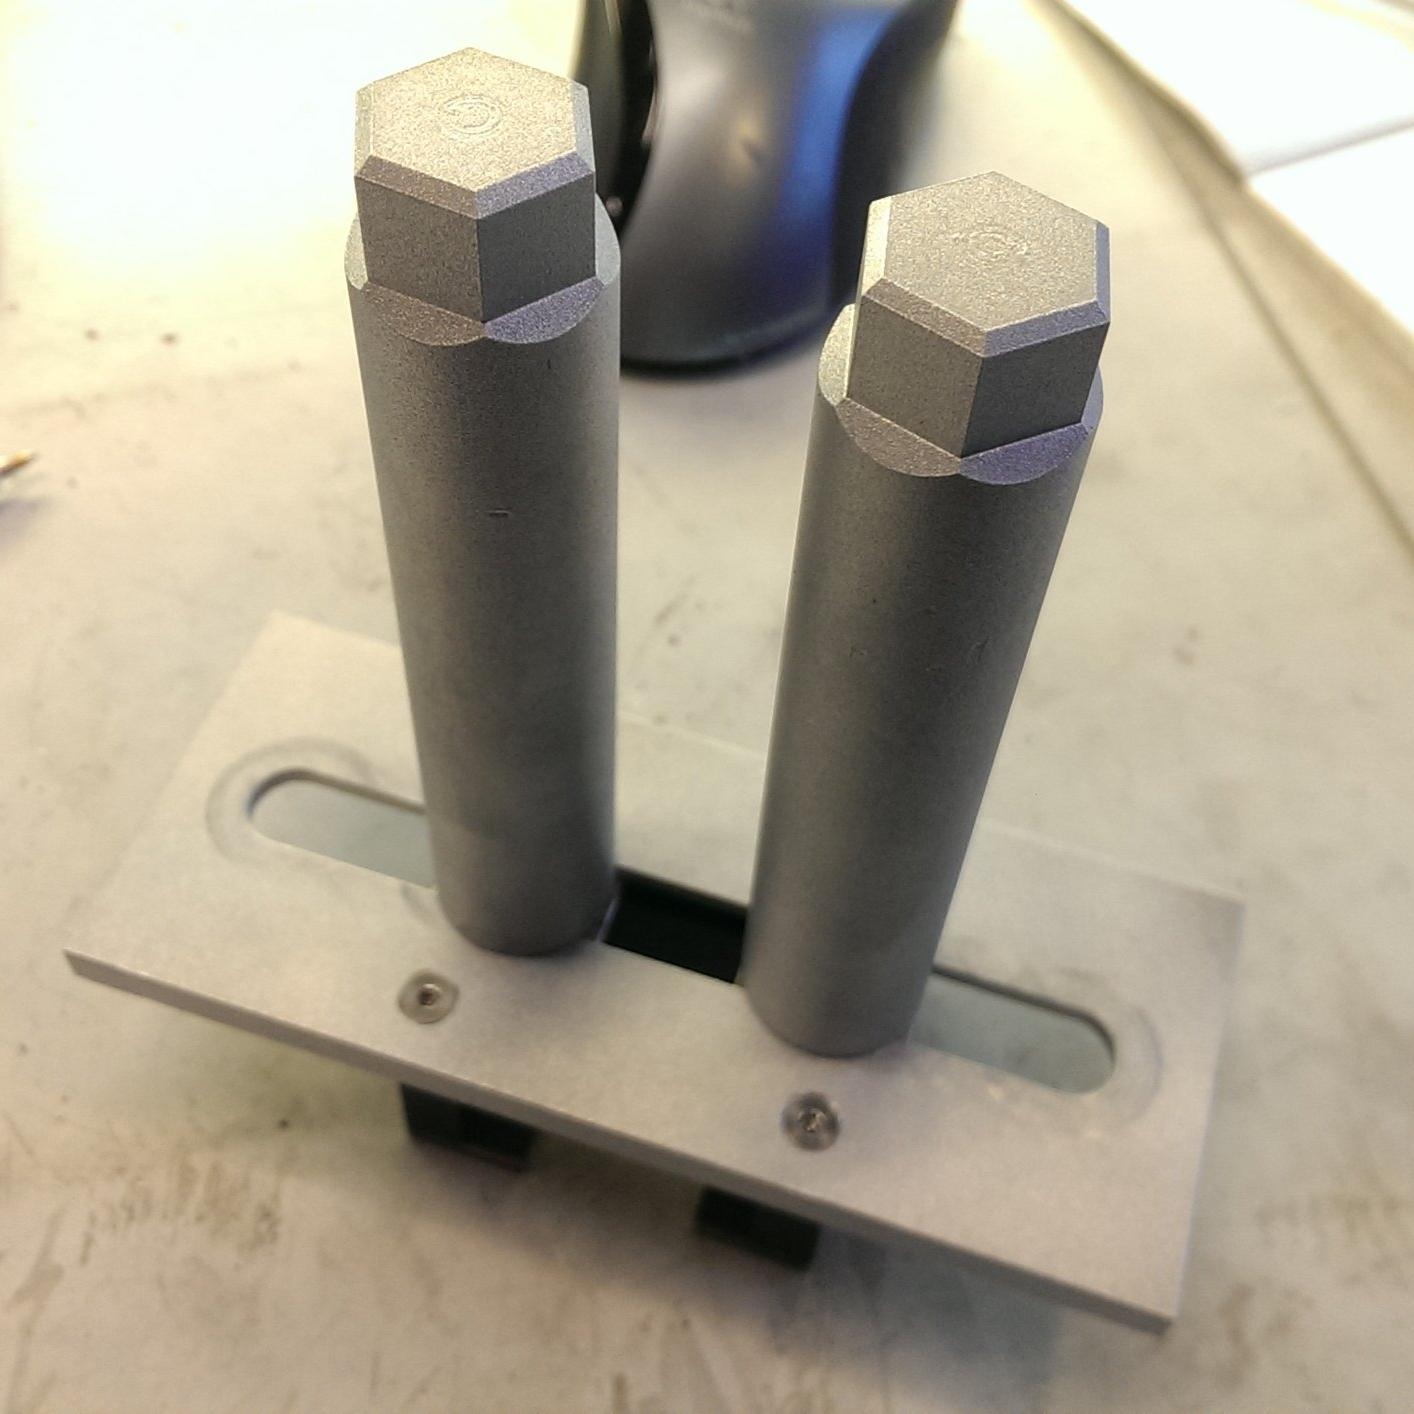 Wrist positioner for strain test